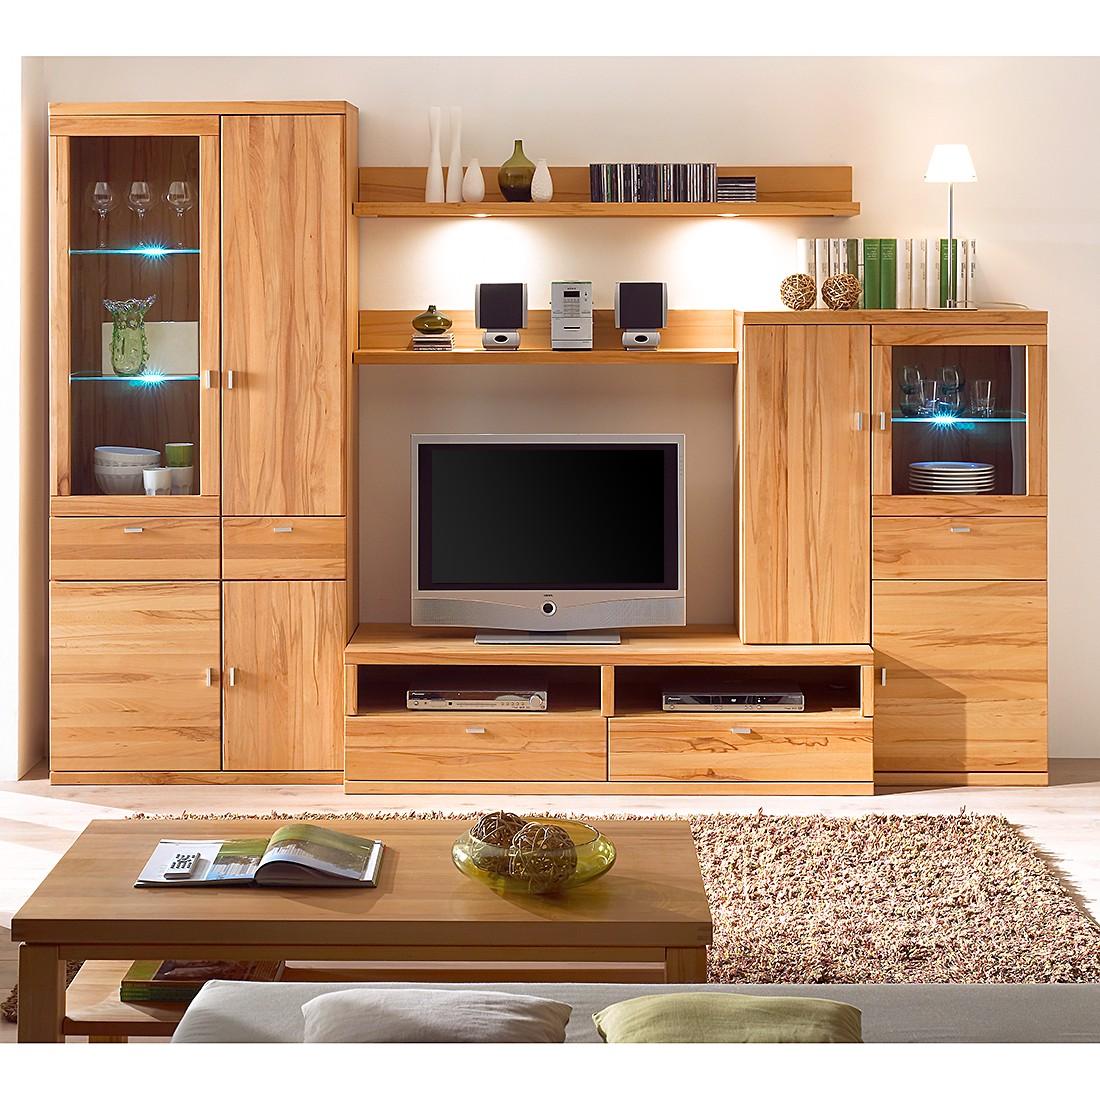 wohnwand monterey 5 teilig kernbuche teilmassiv. Black Bedroom Furniture Sets. Home Design Ideas